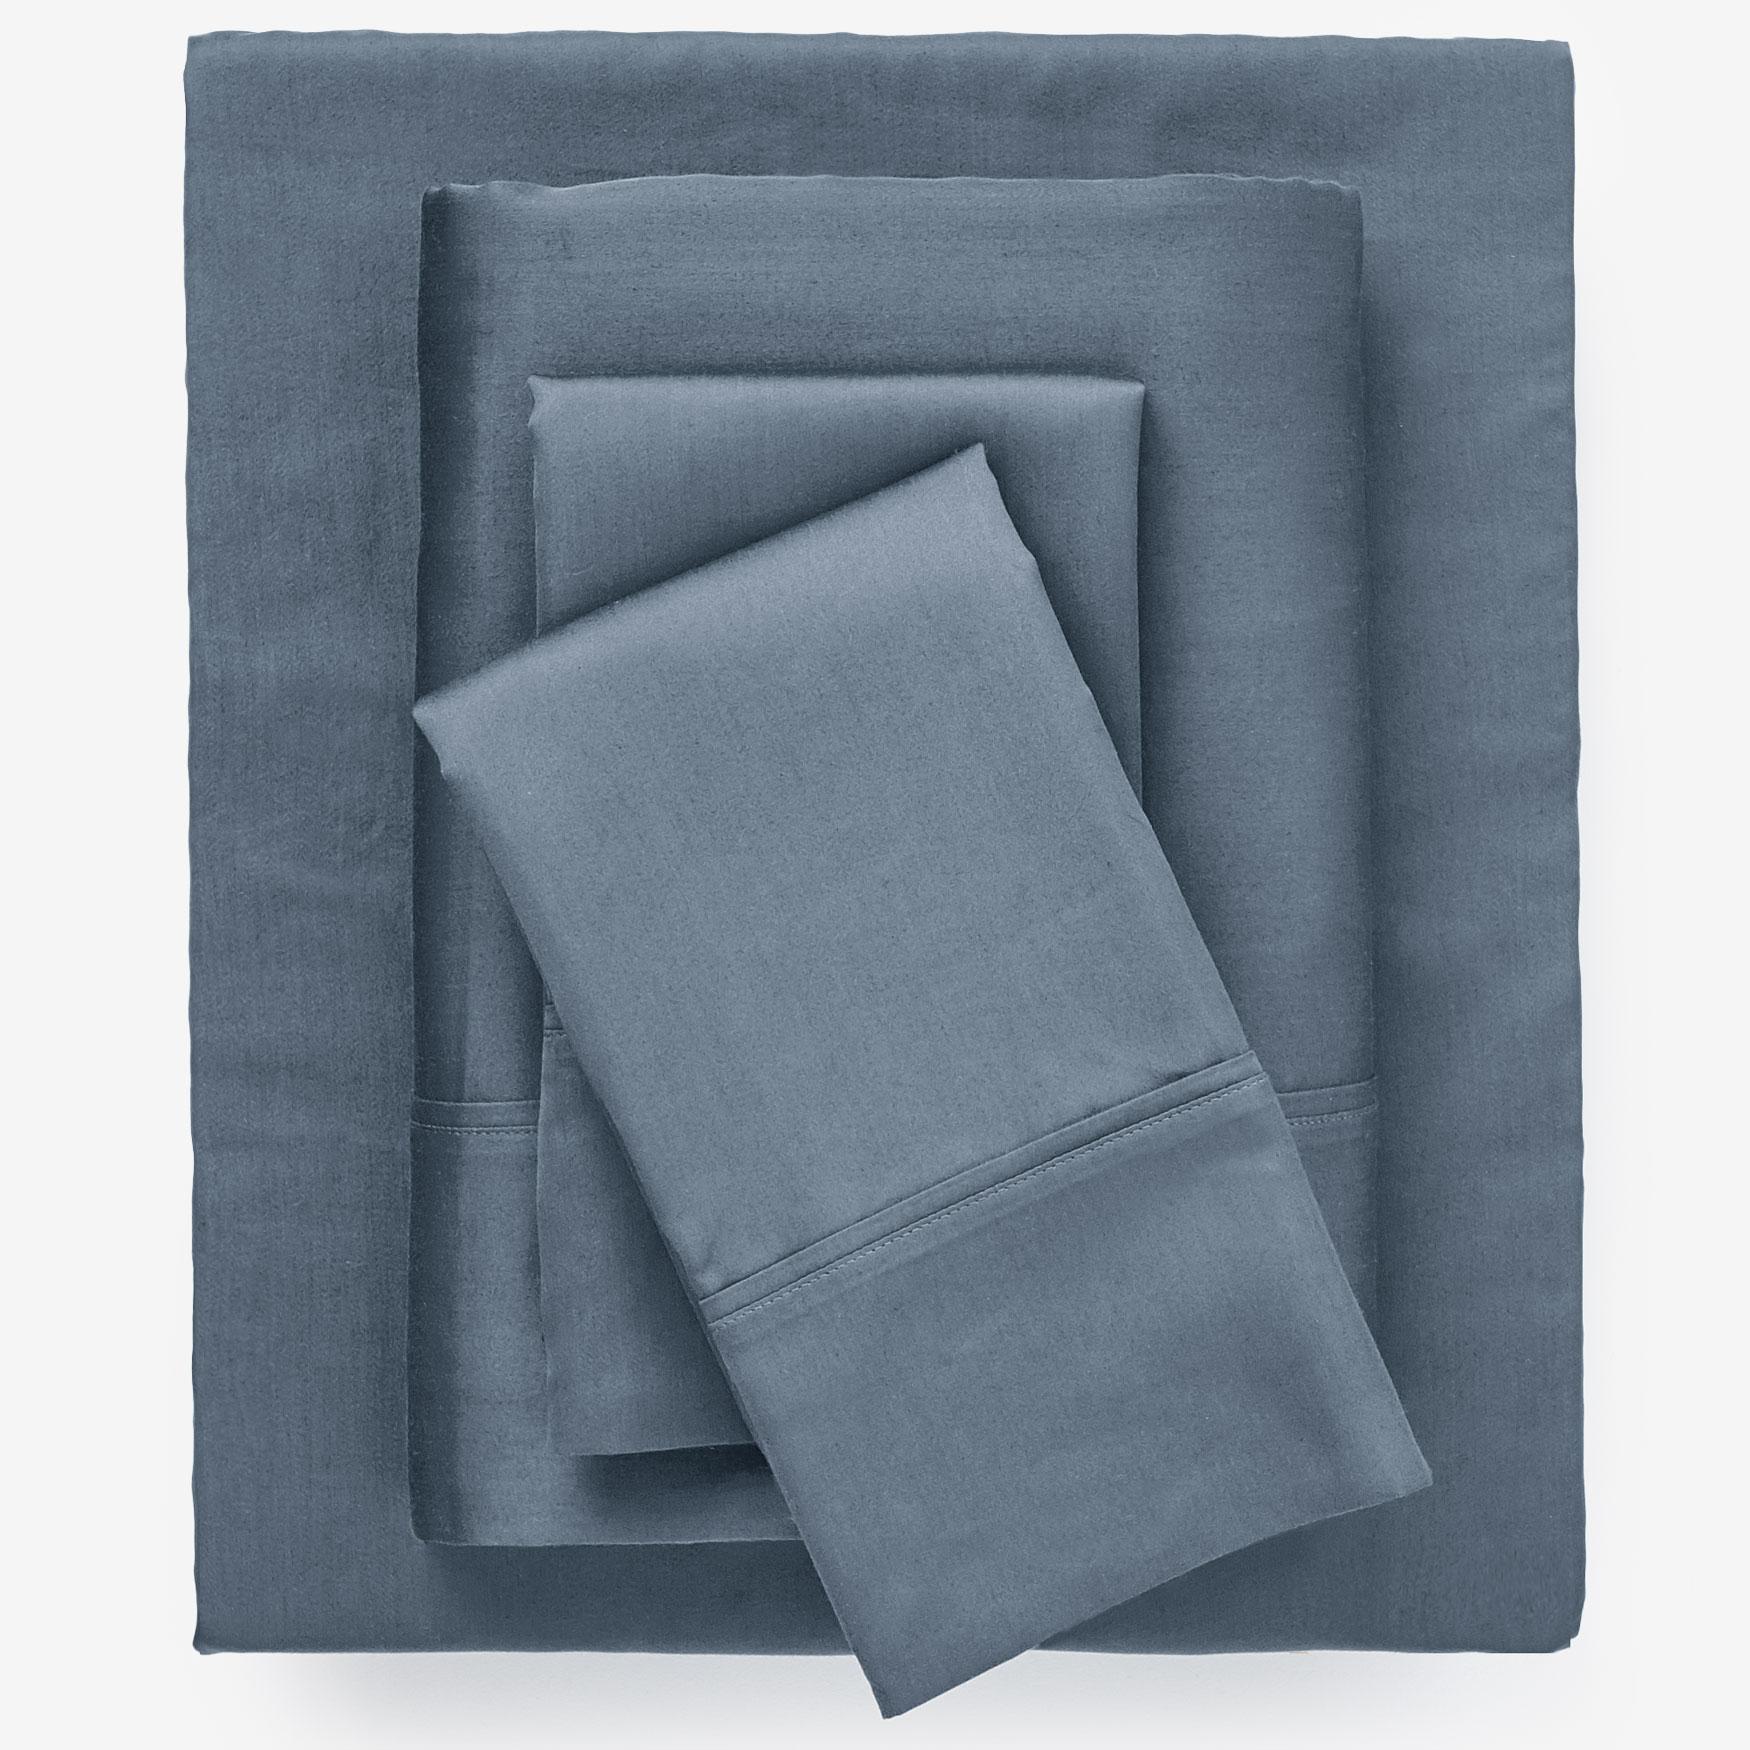 Bed E 500 Tc Cotton Poly Blend Sheet Set